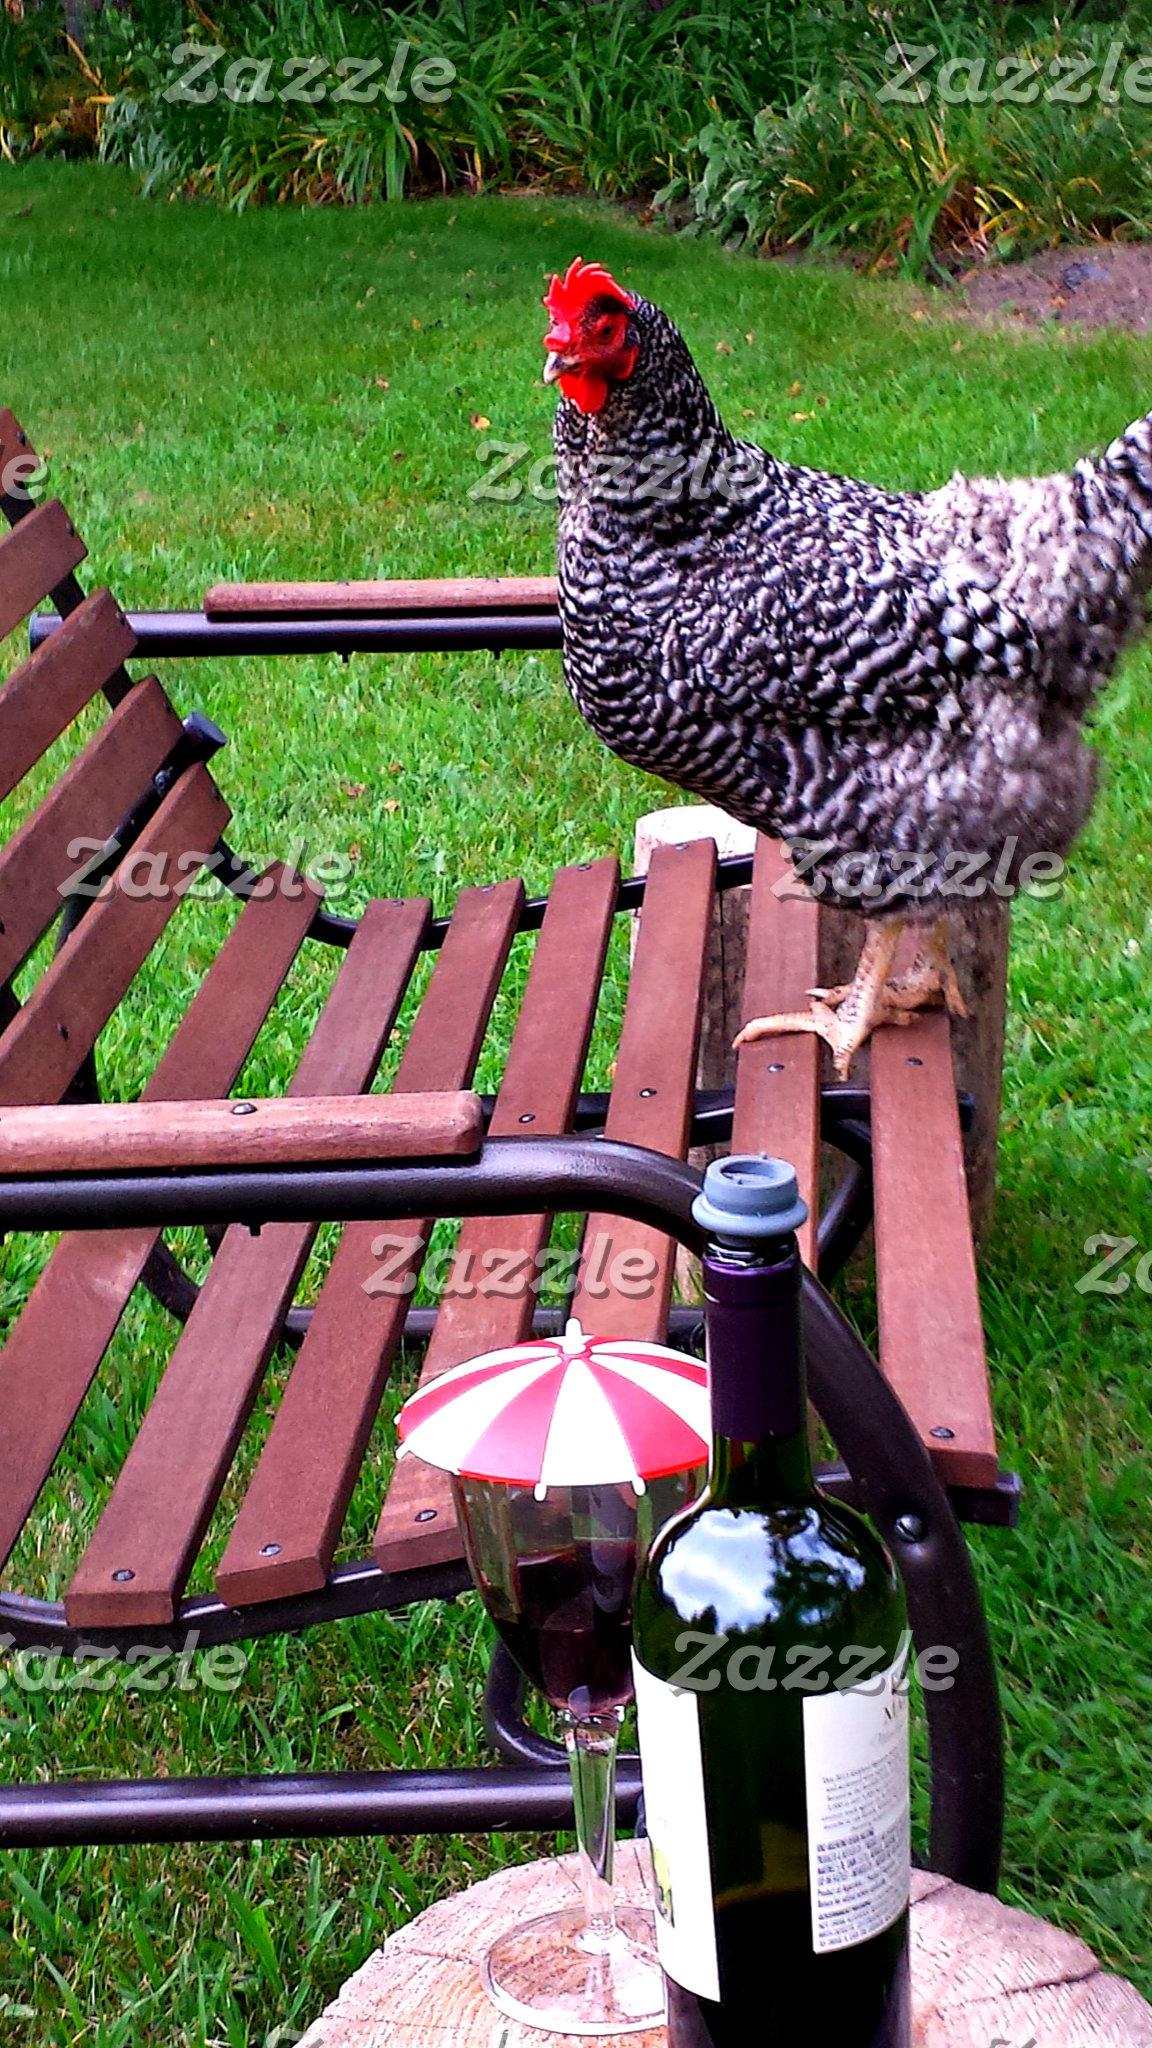 Crazy Chicken Lady! Stationery Store